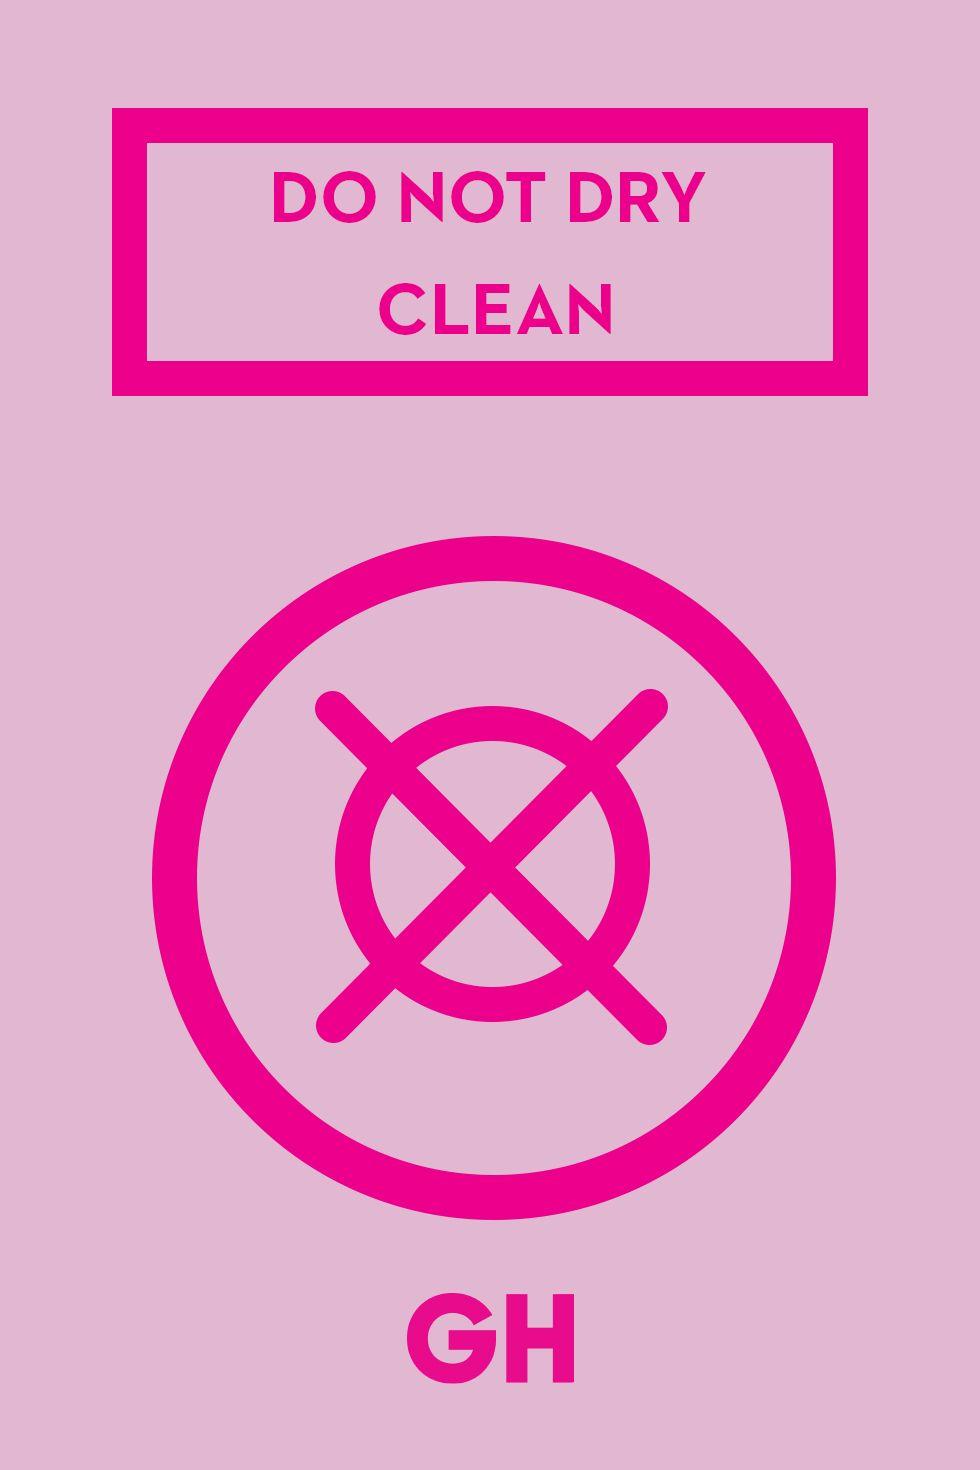 Guide to laundry symbols laundry symbols decoded biocorpaavc Gallery